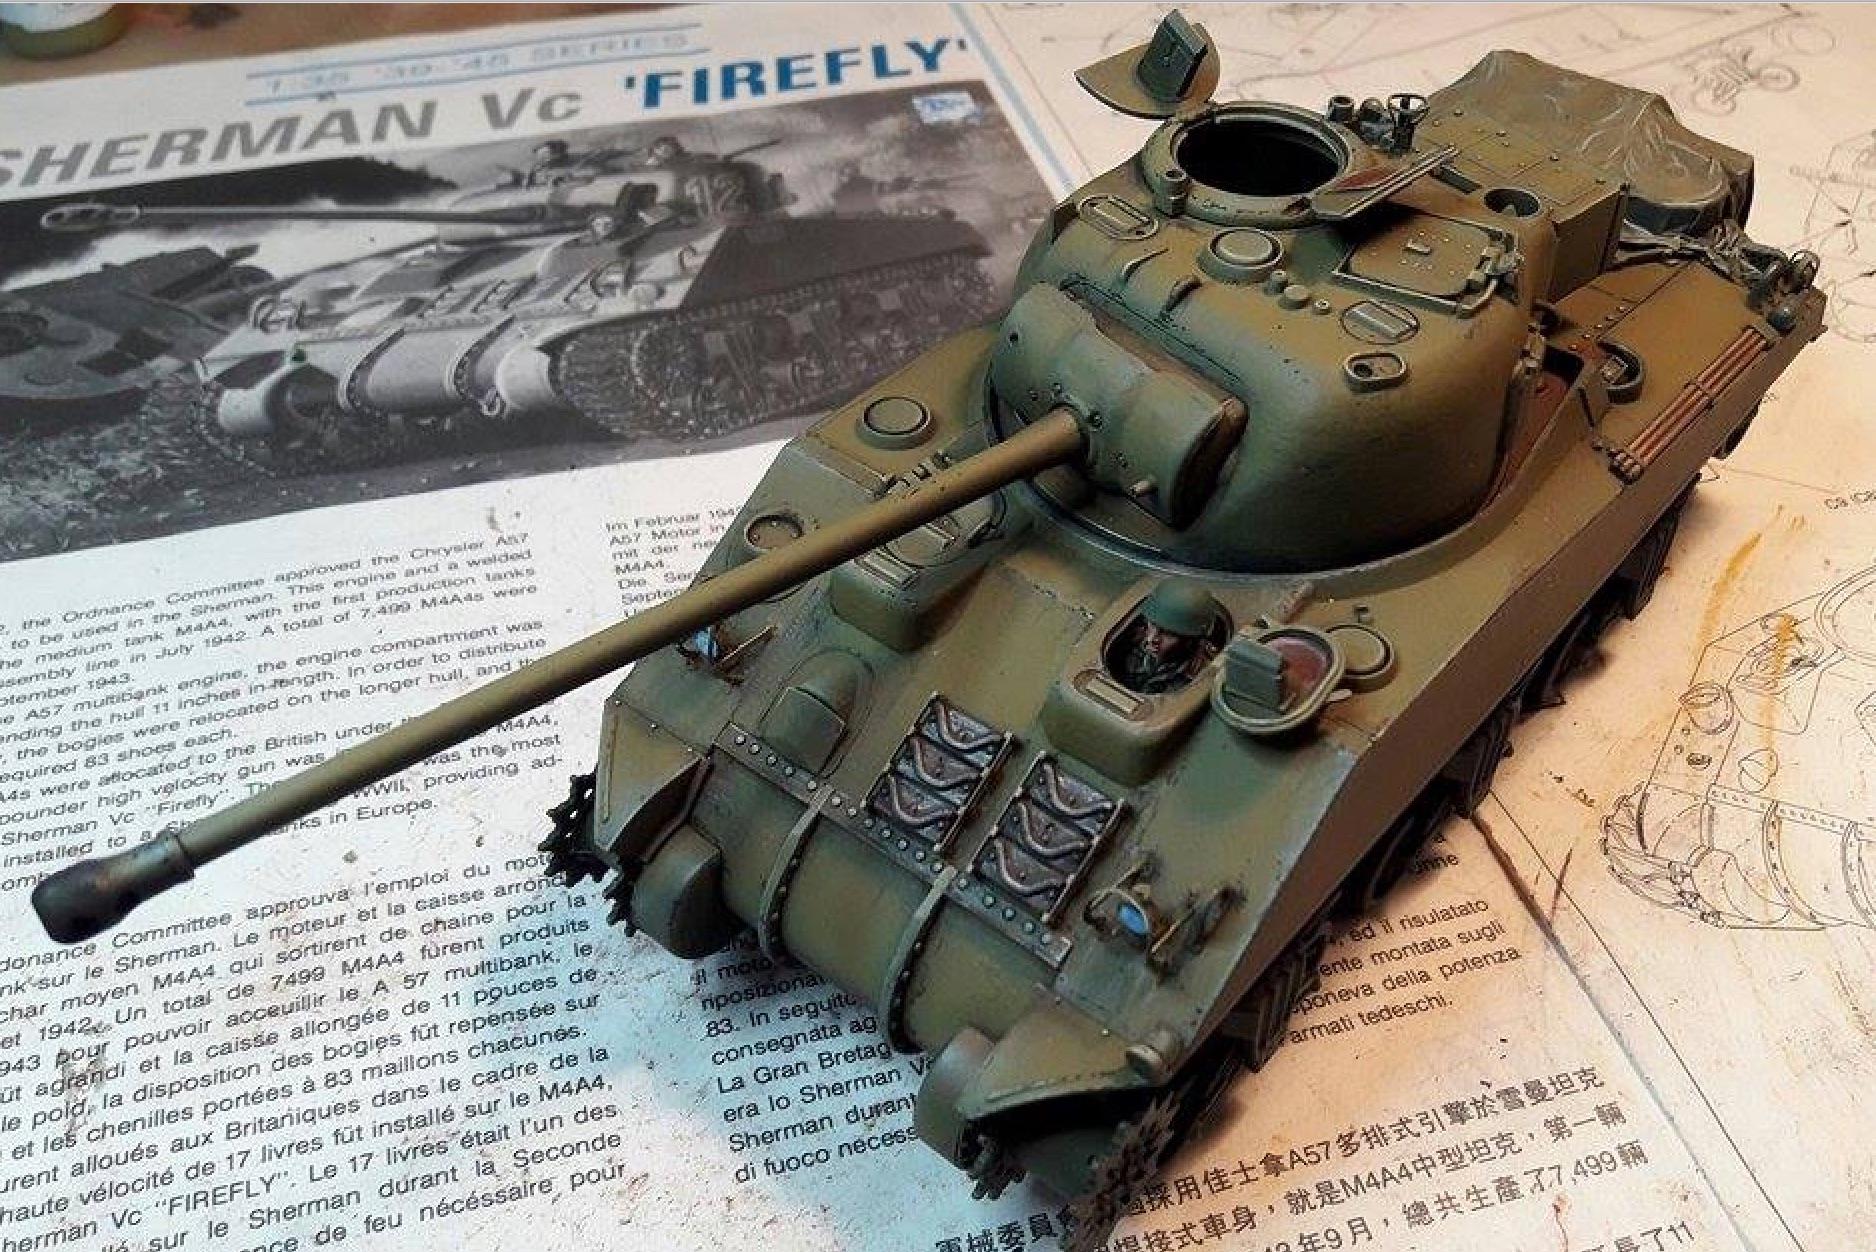 Sherman Vc Firefly - 1/35ème - kit Dragon #6031 Sherman Vc 'Firefly' - Page 2 9440252stShadowsLightshead